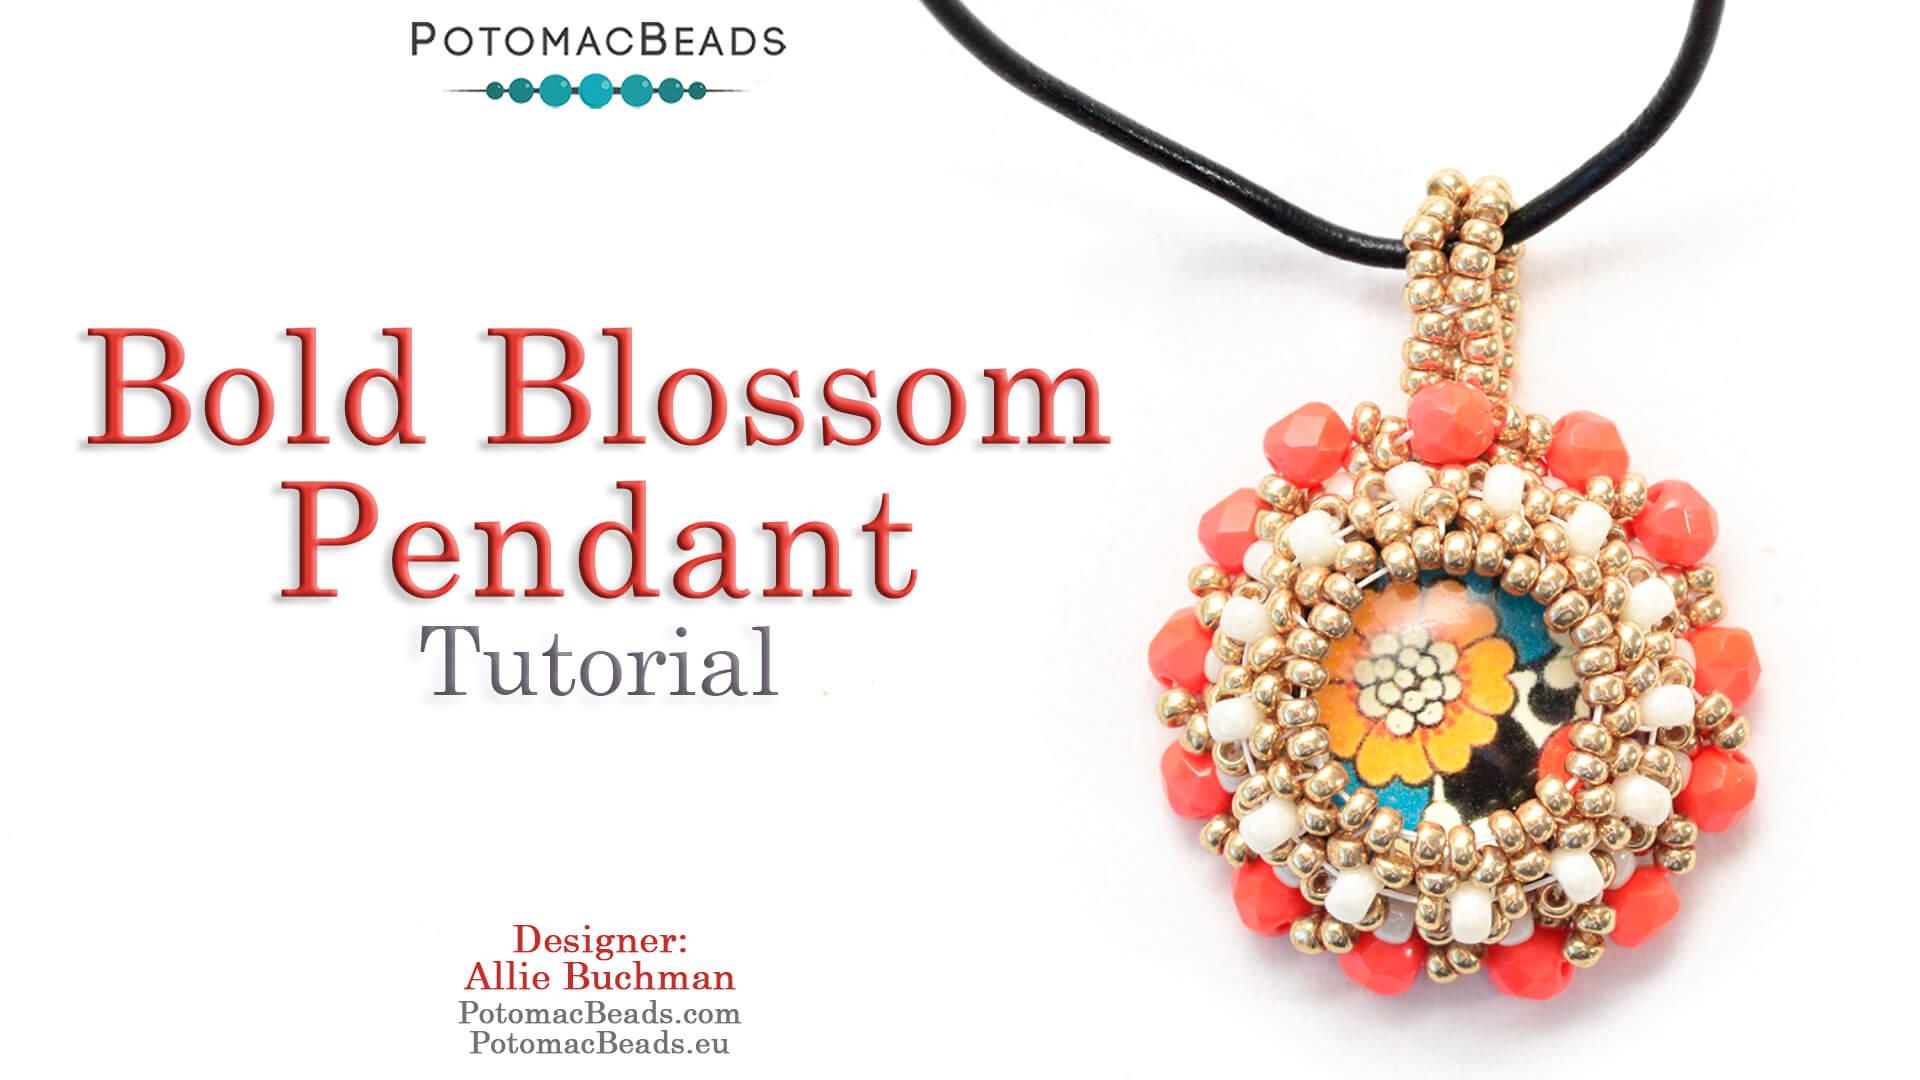 Bold Blossom Pendant Tutorial